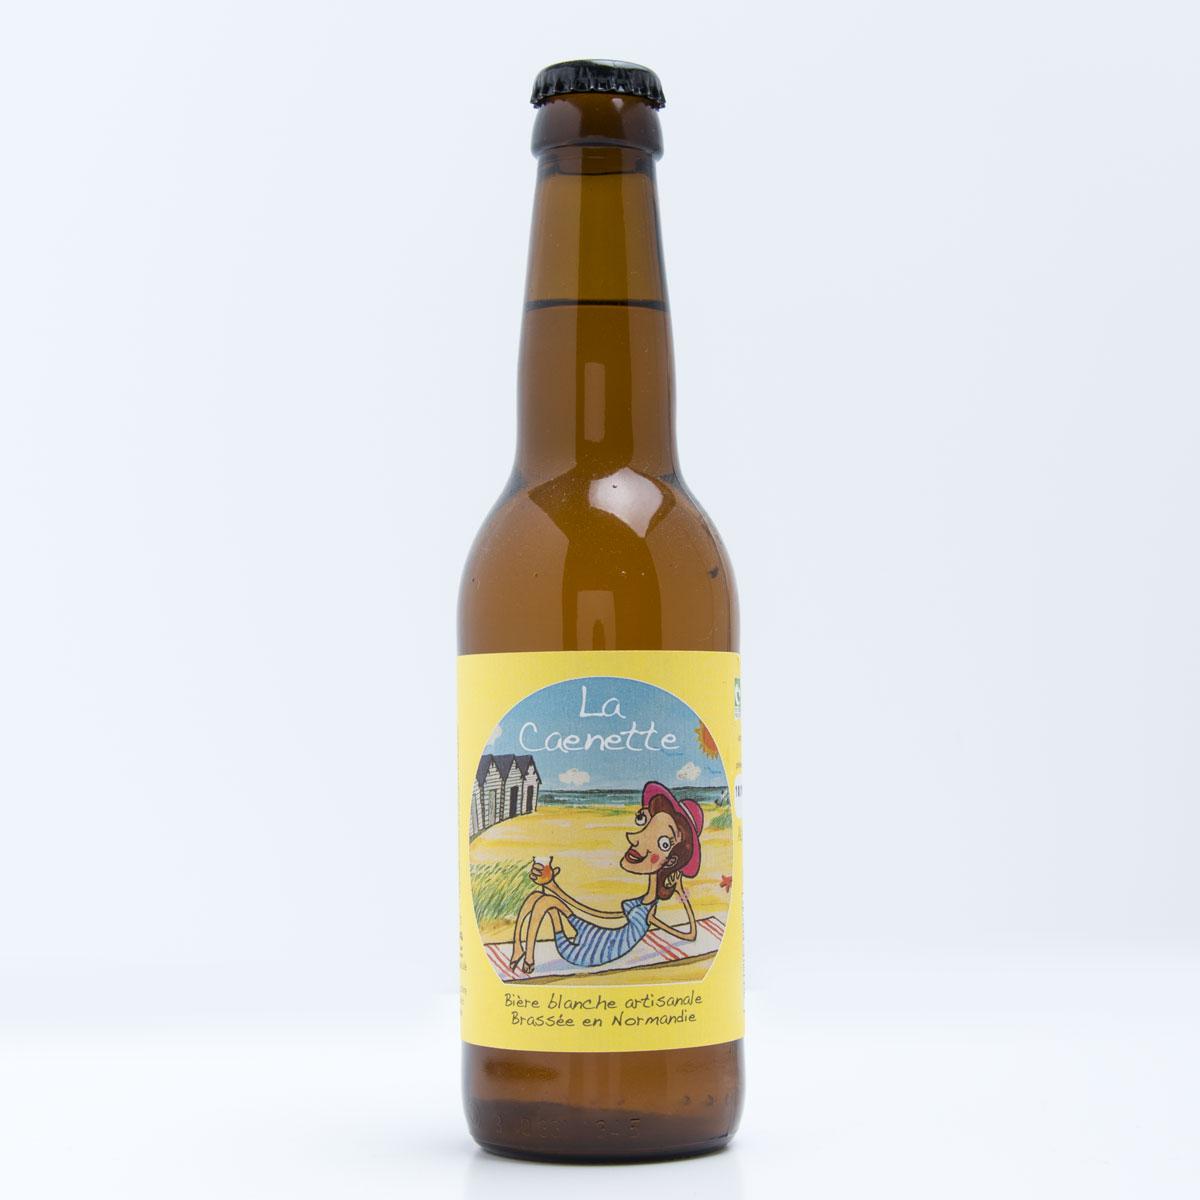 la-caenette-biere-blanche-artisanale-normandie